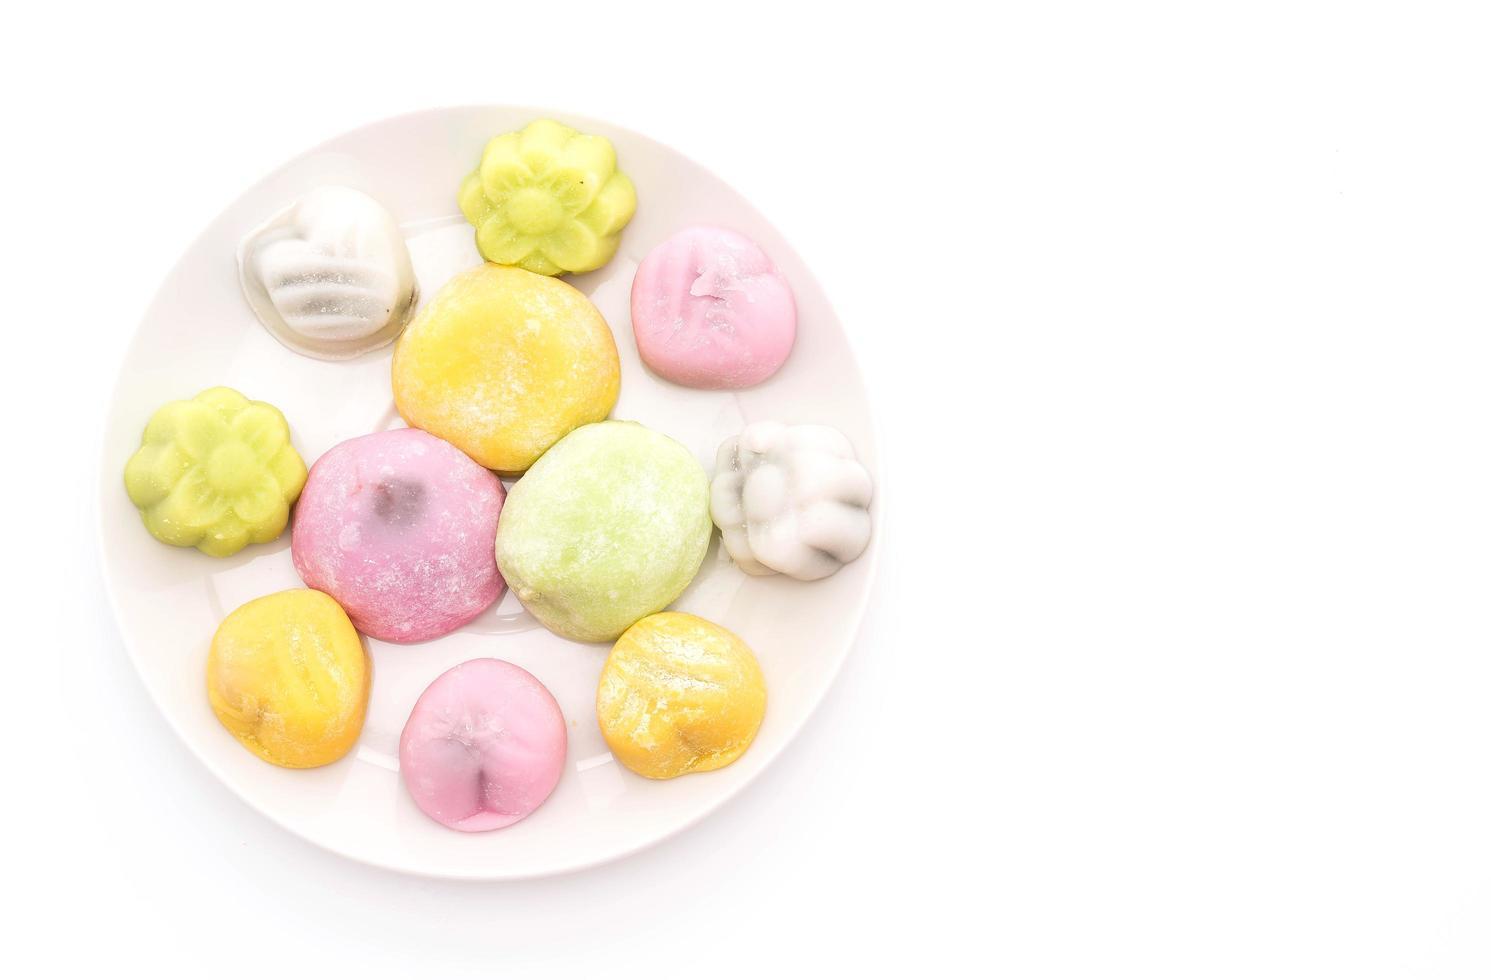 dessert mochi på vit bakgrund foto